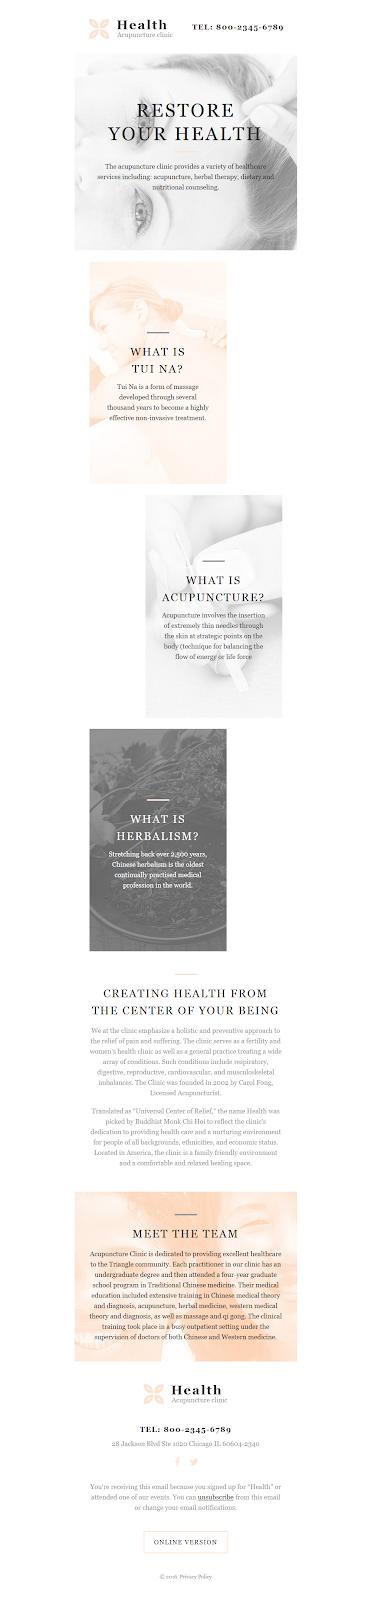 Screenshot of Medical Responsive Newsletter Template